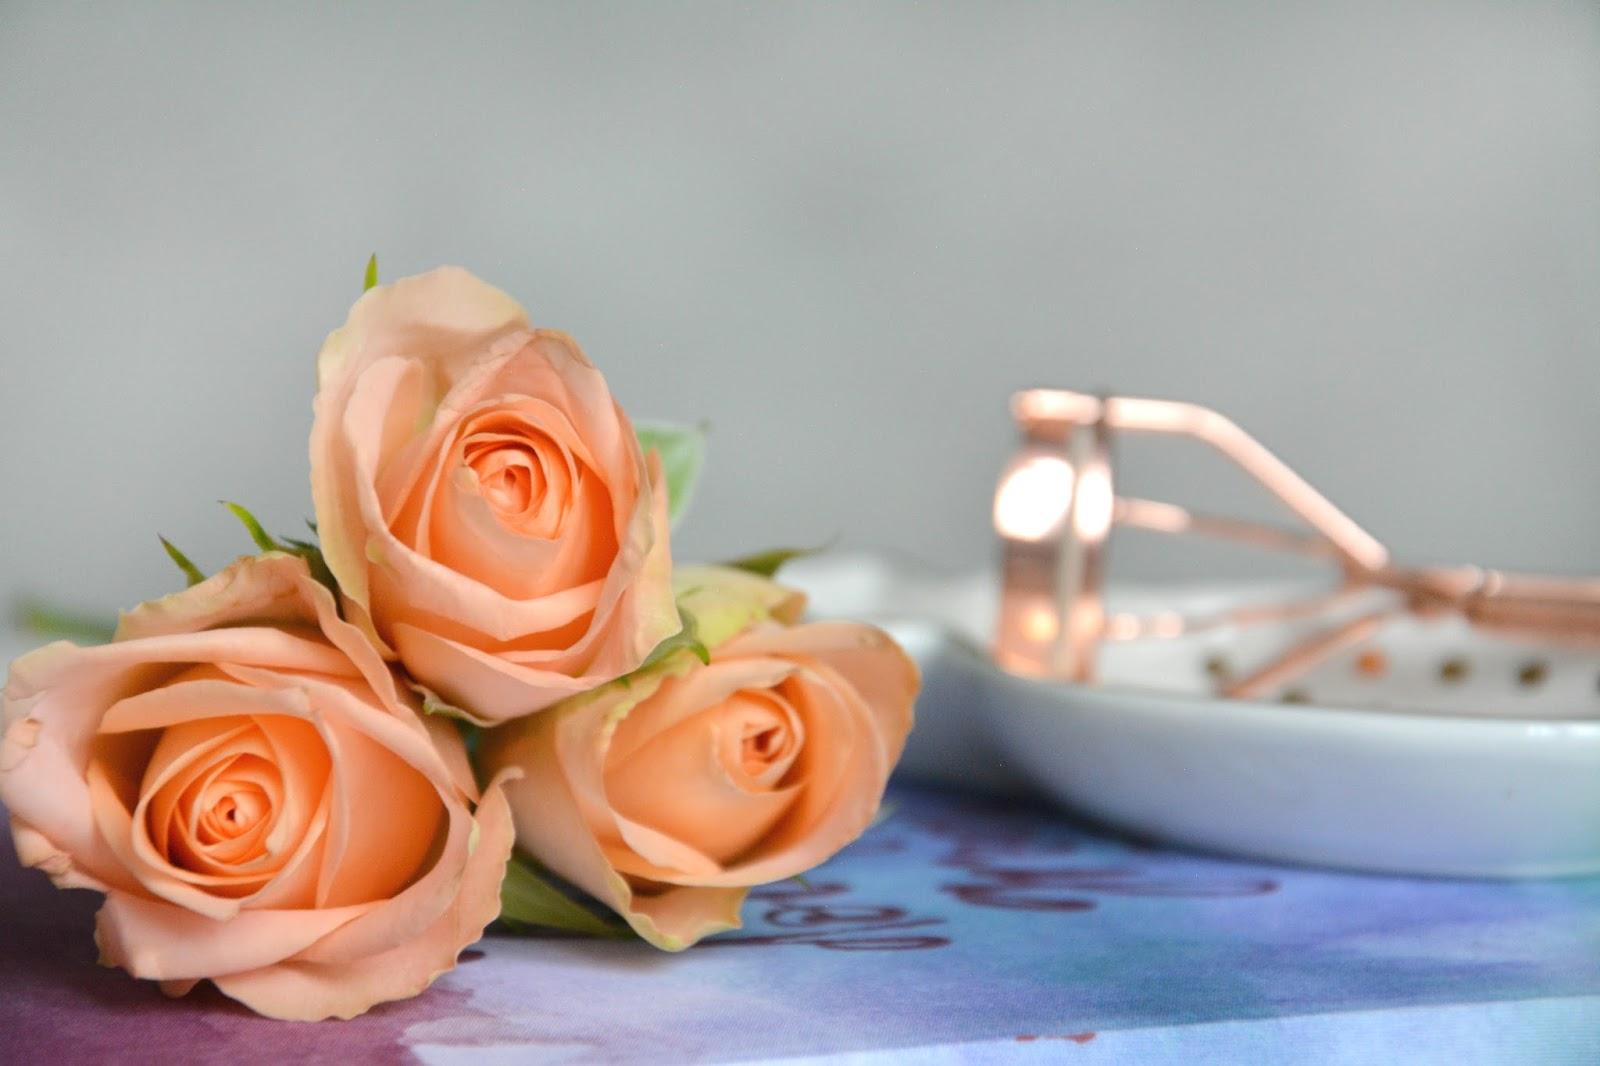 Primark Rosegold Eyelash Curler; Hema Notebook; Fresh Roses; Primark Pineapple Dish